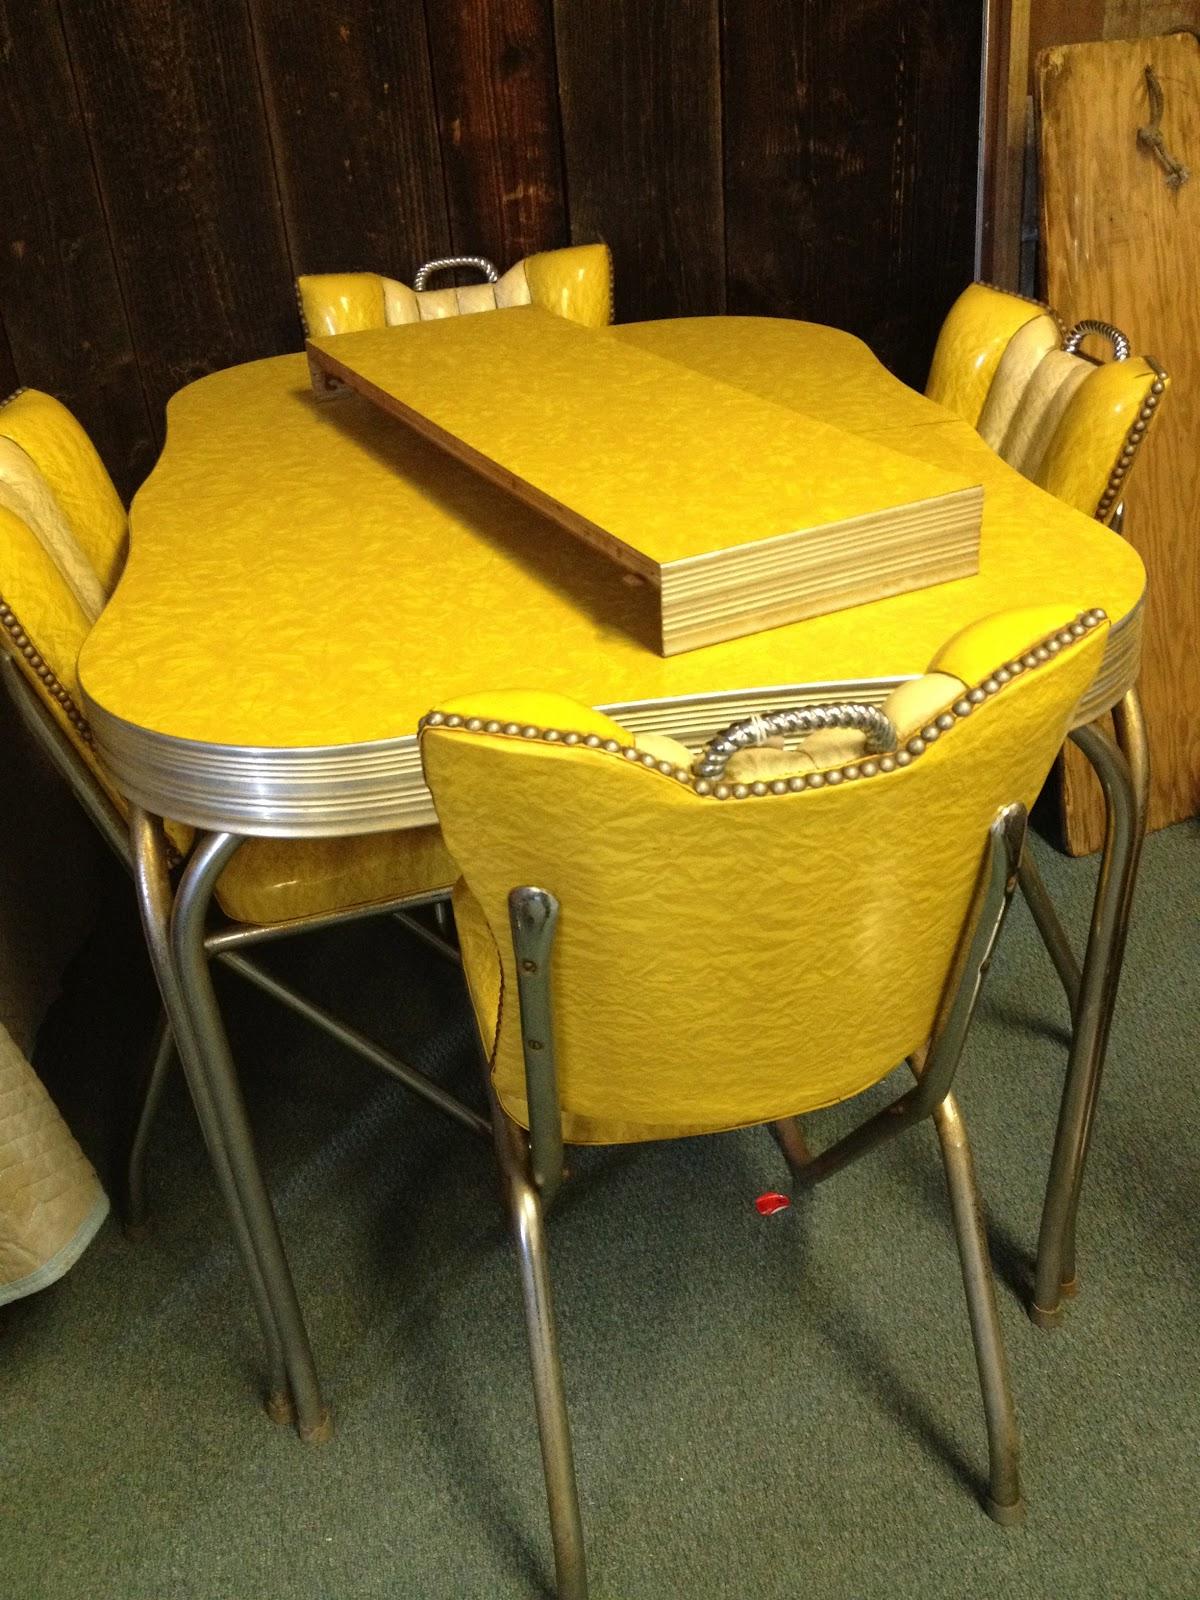 retro kitchen chairs yellow photo - 10